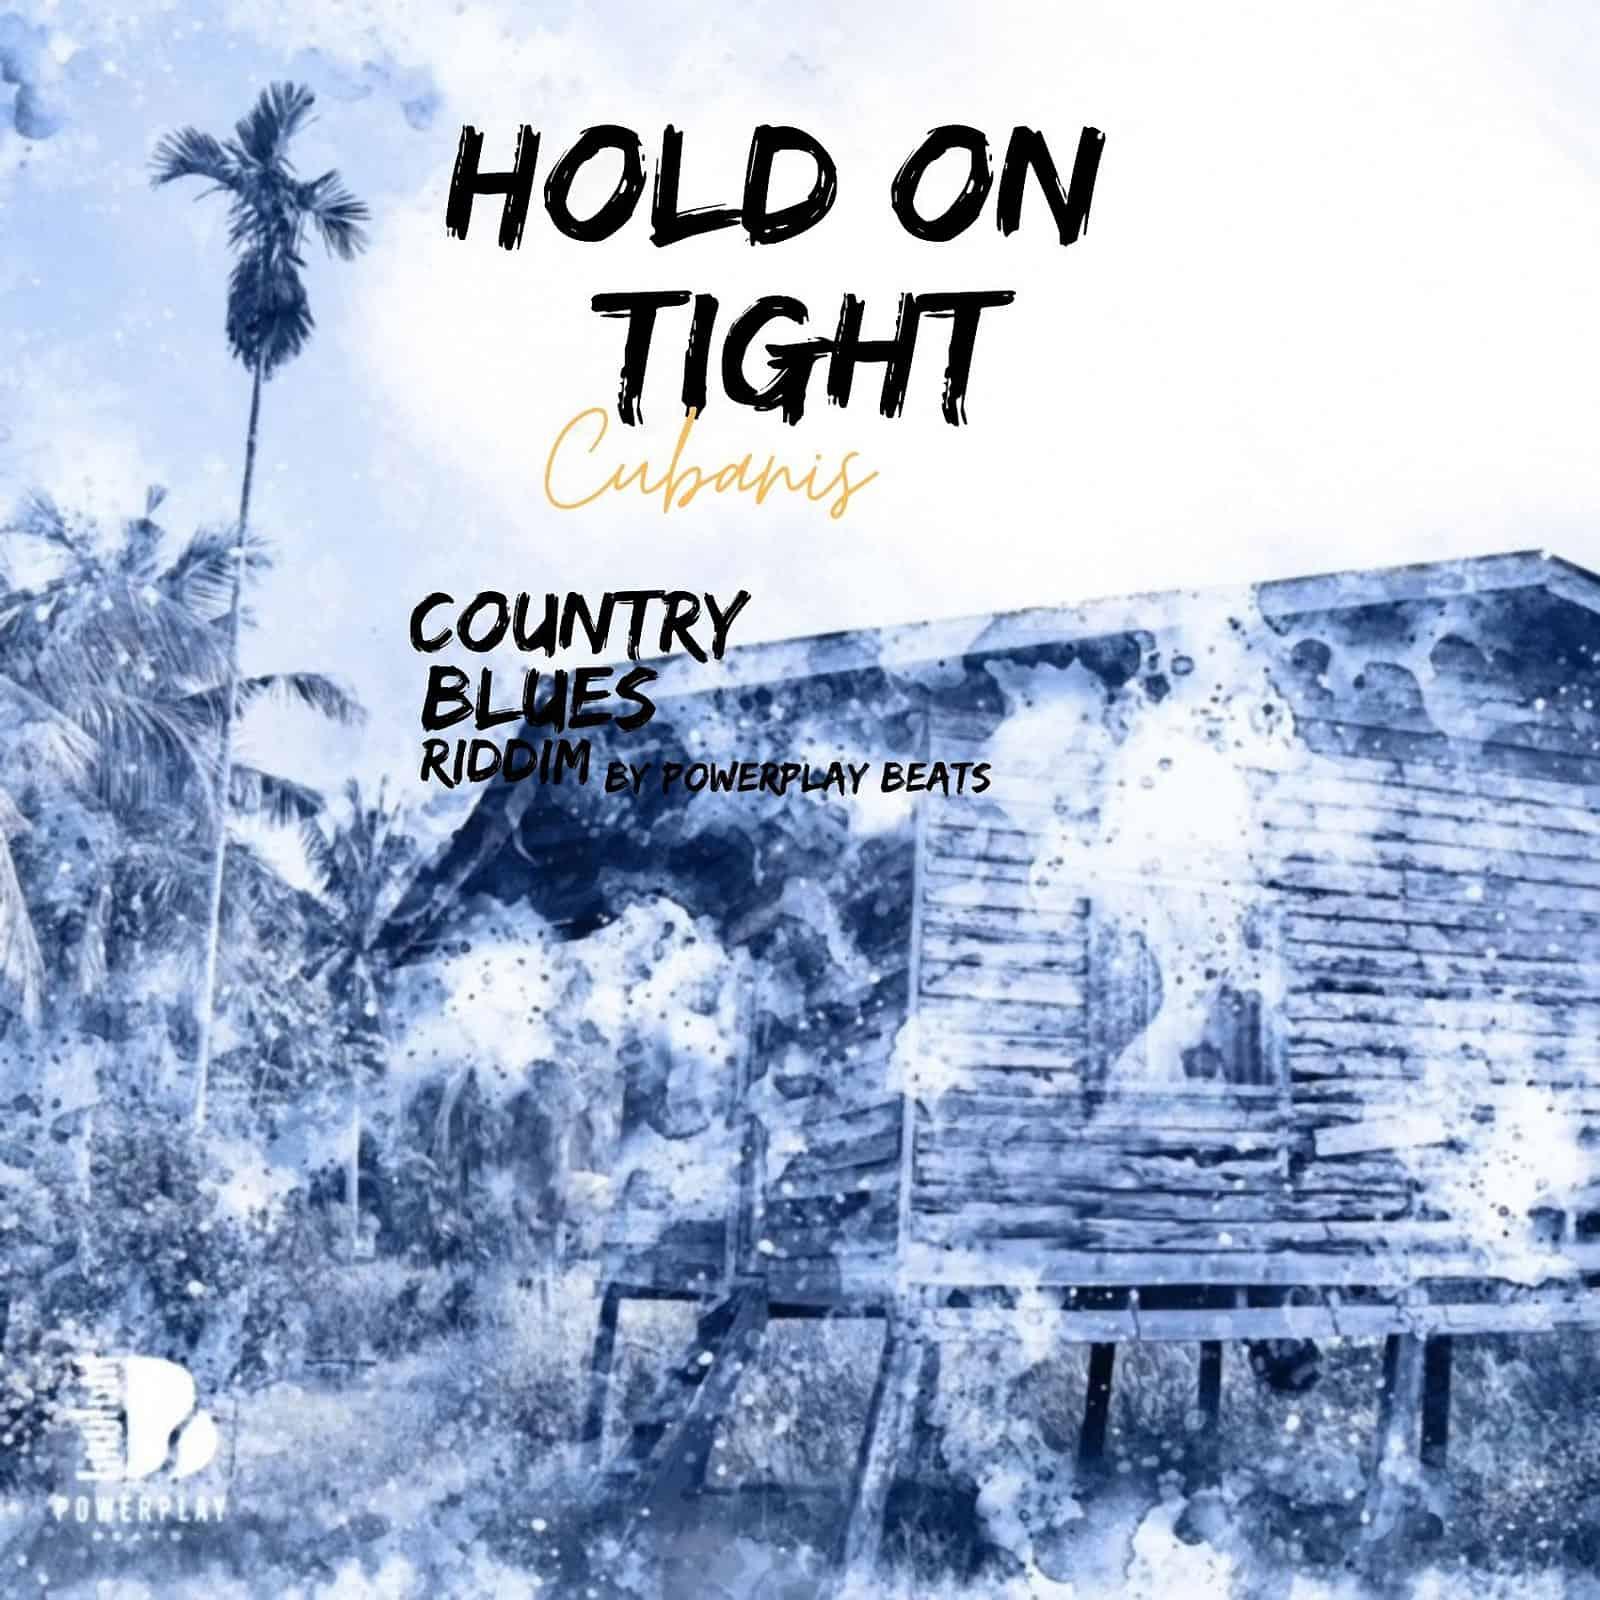 Hold On Tight - Cubanis - The DMV Anthem (Country Blues Riddim)